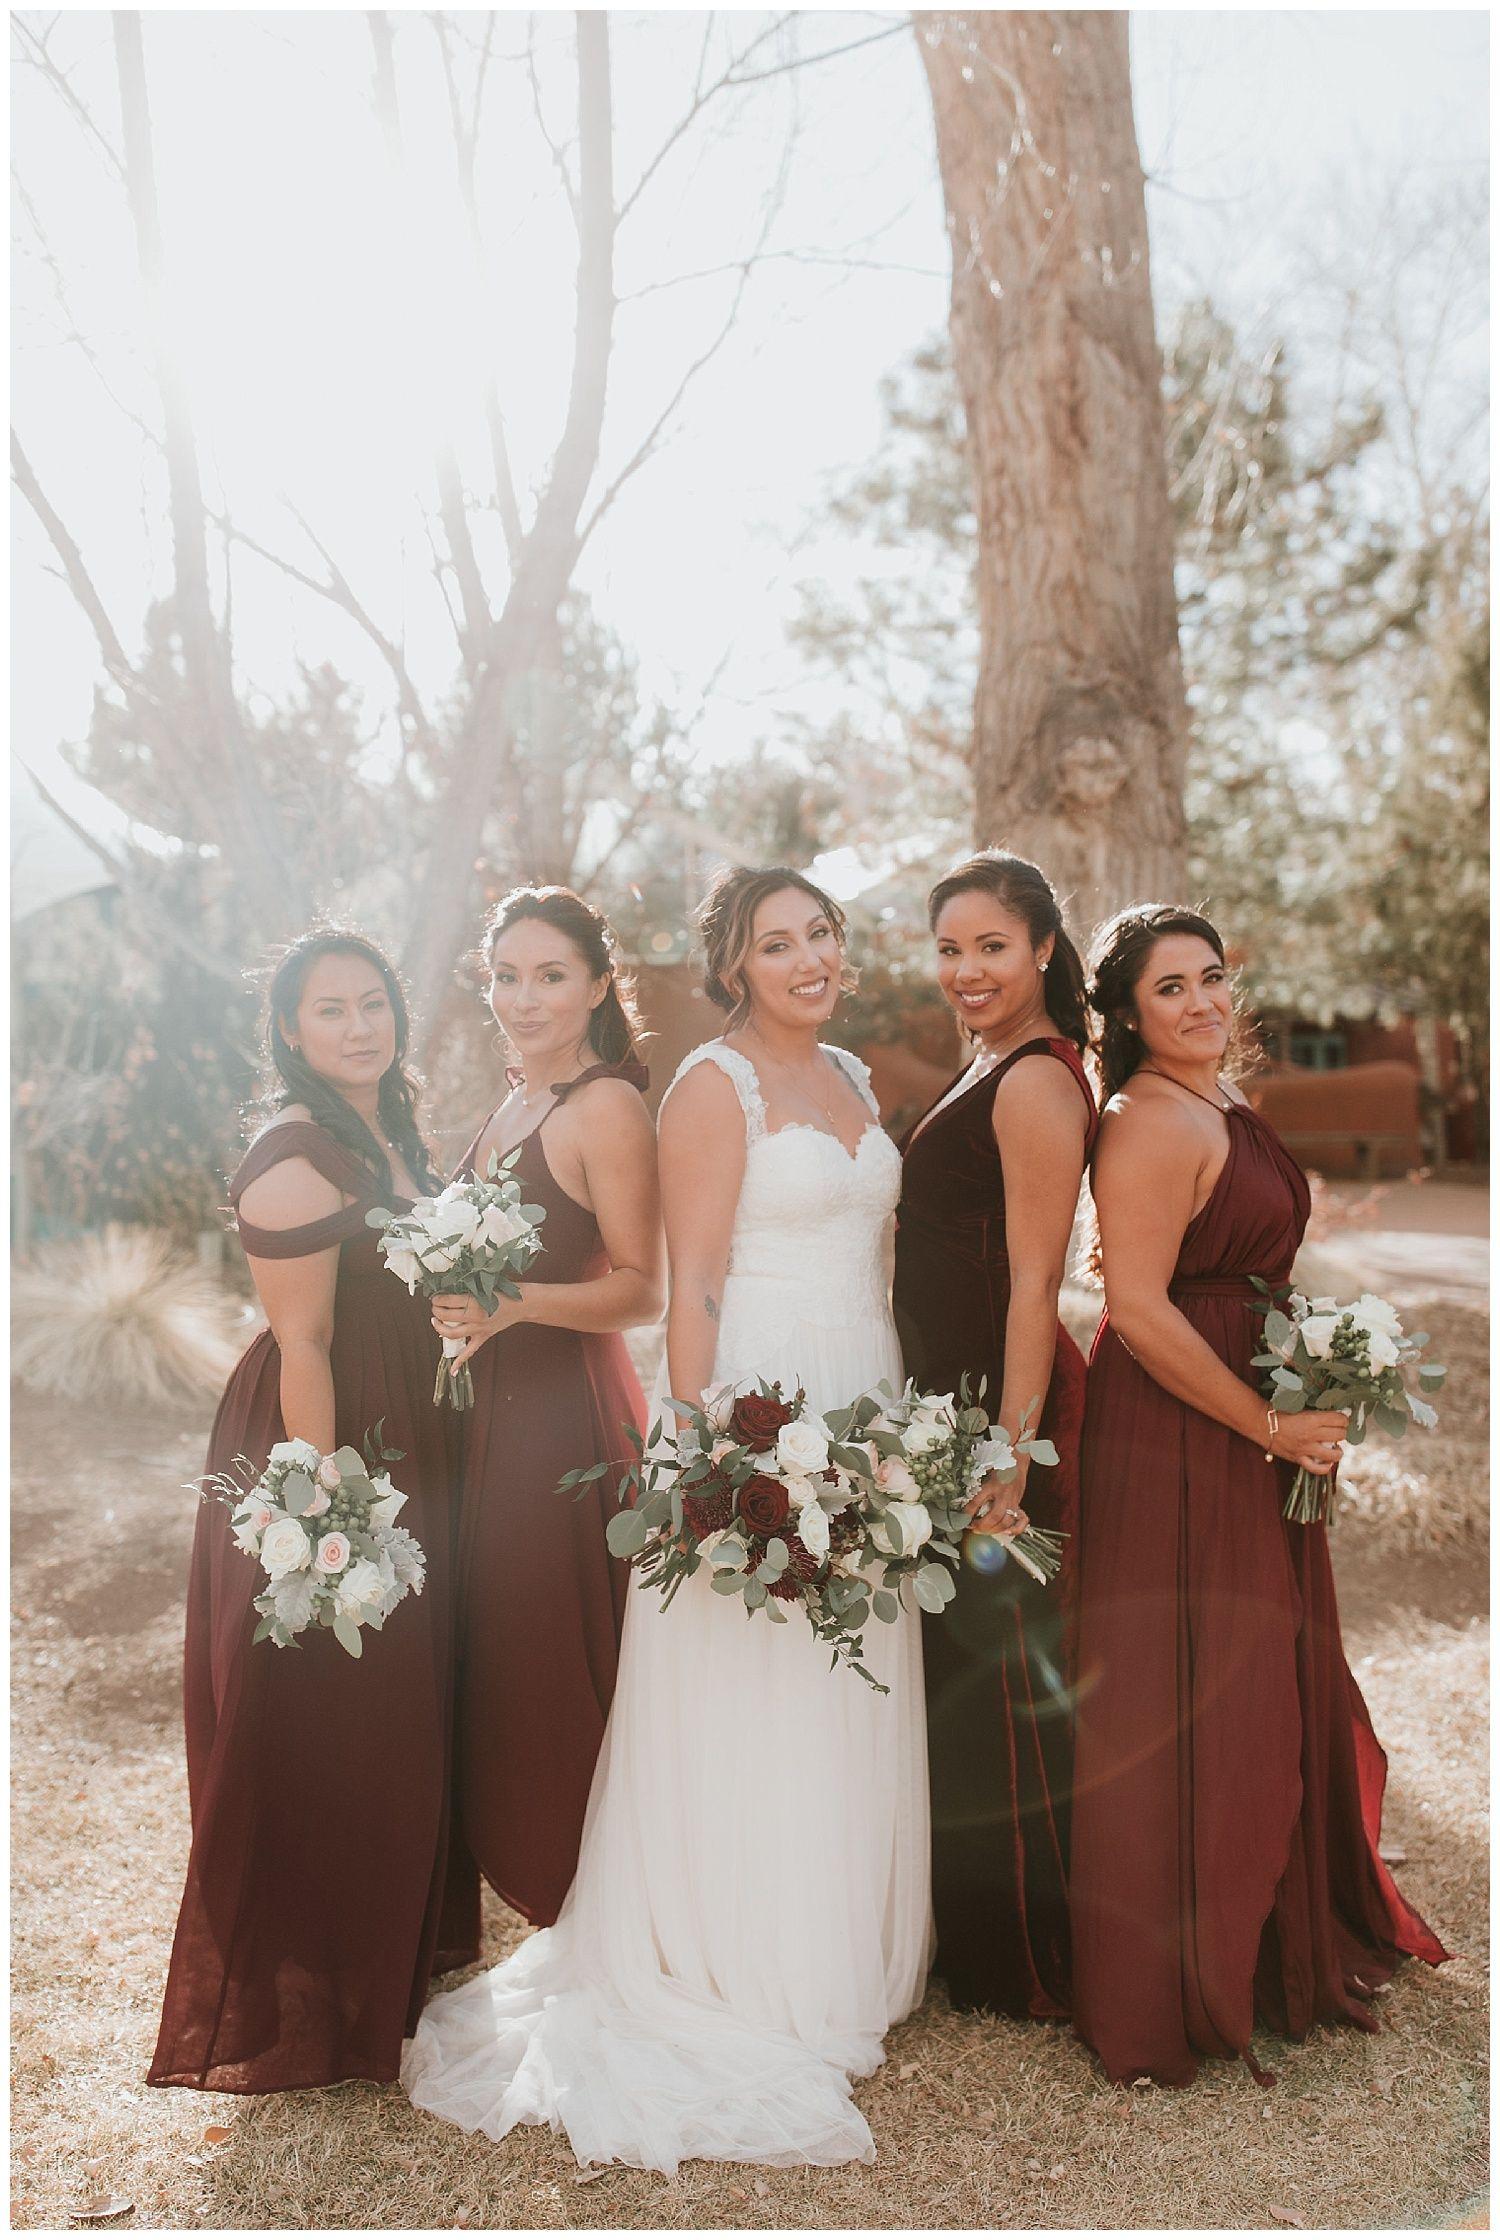 Bridesmaid Style in 2018 | bridesmaid inspo | Pinterest ...